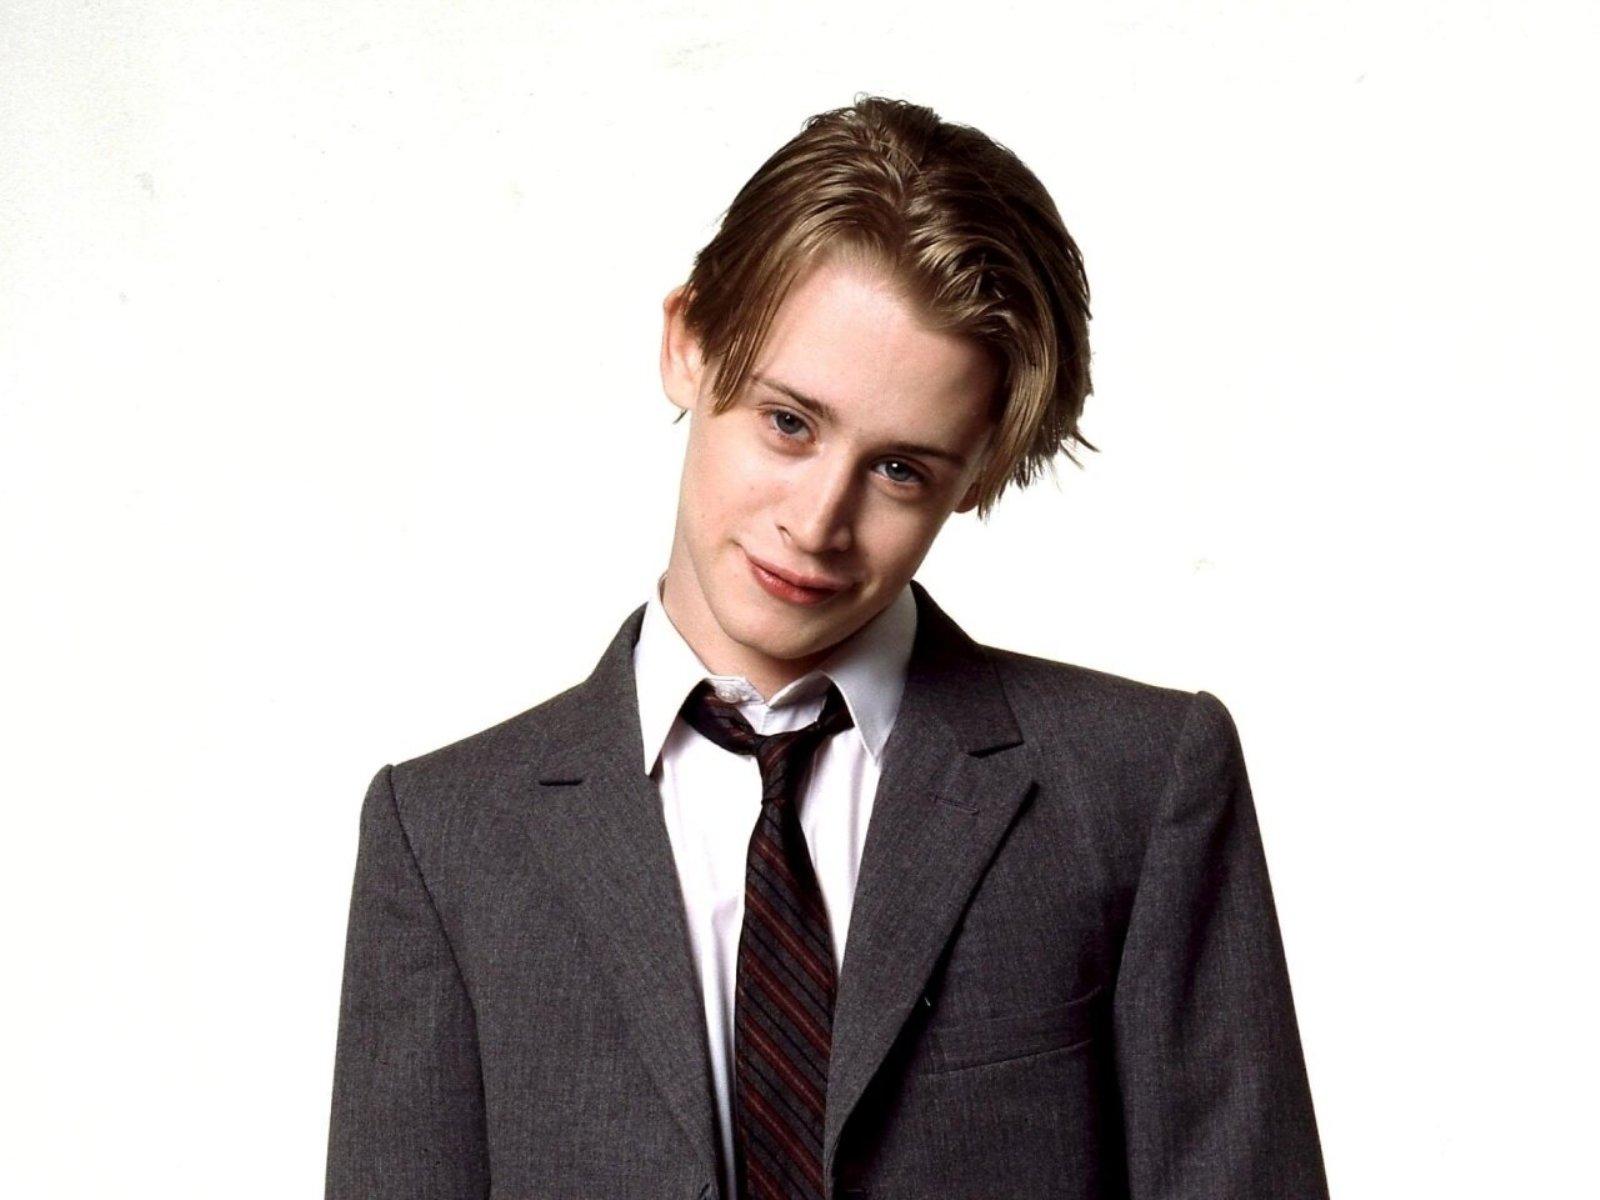 Actor Macaulay Culkin - age: 2